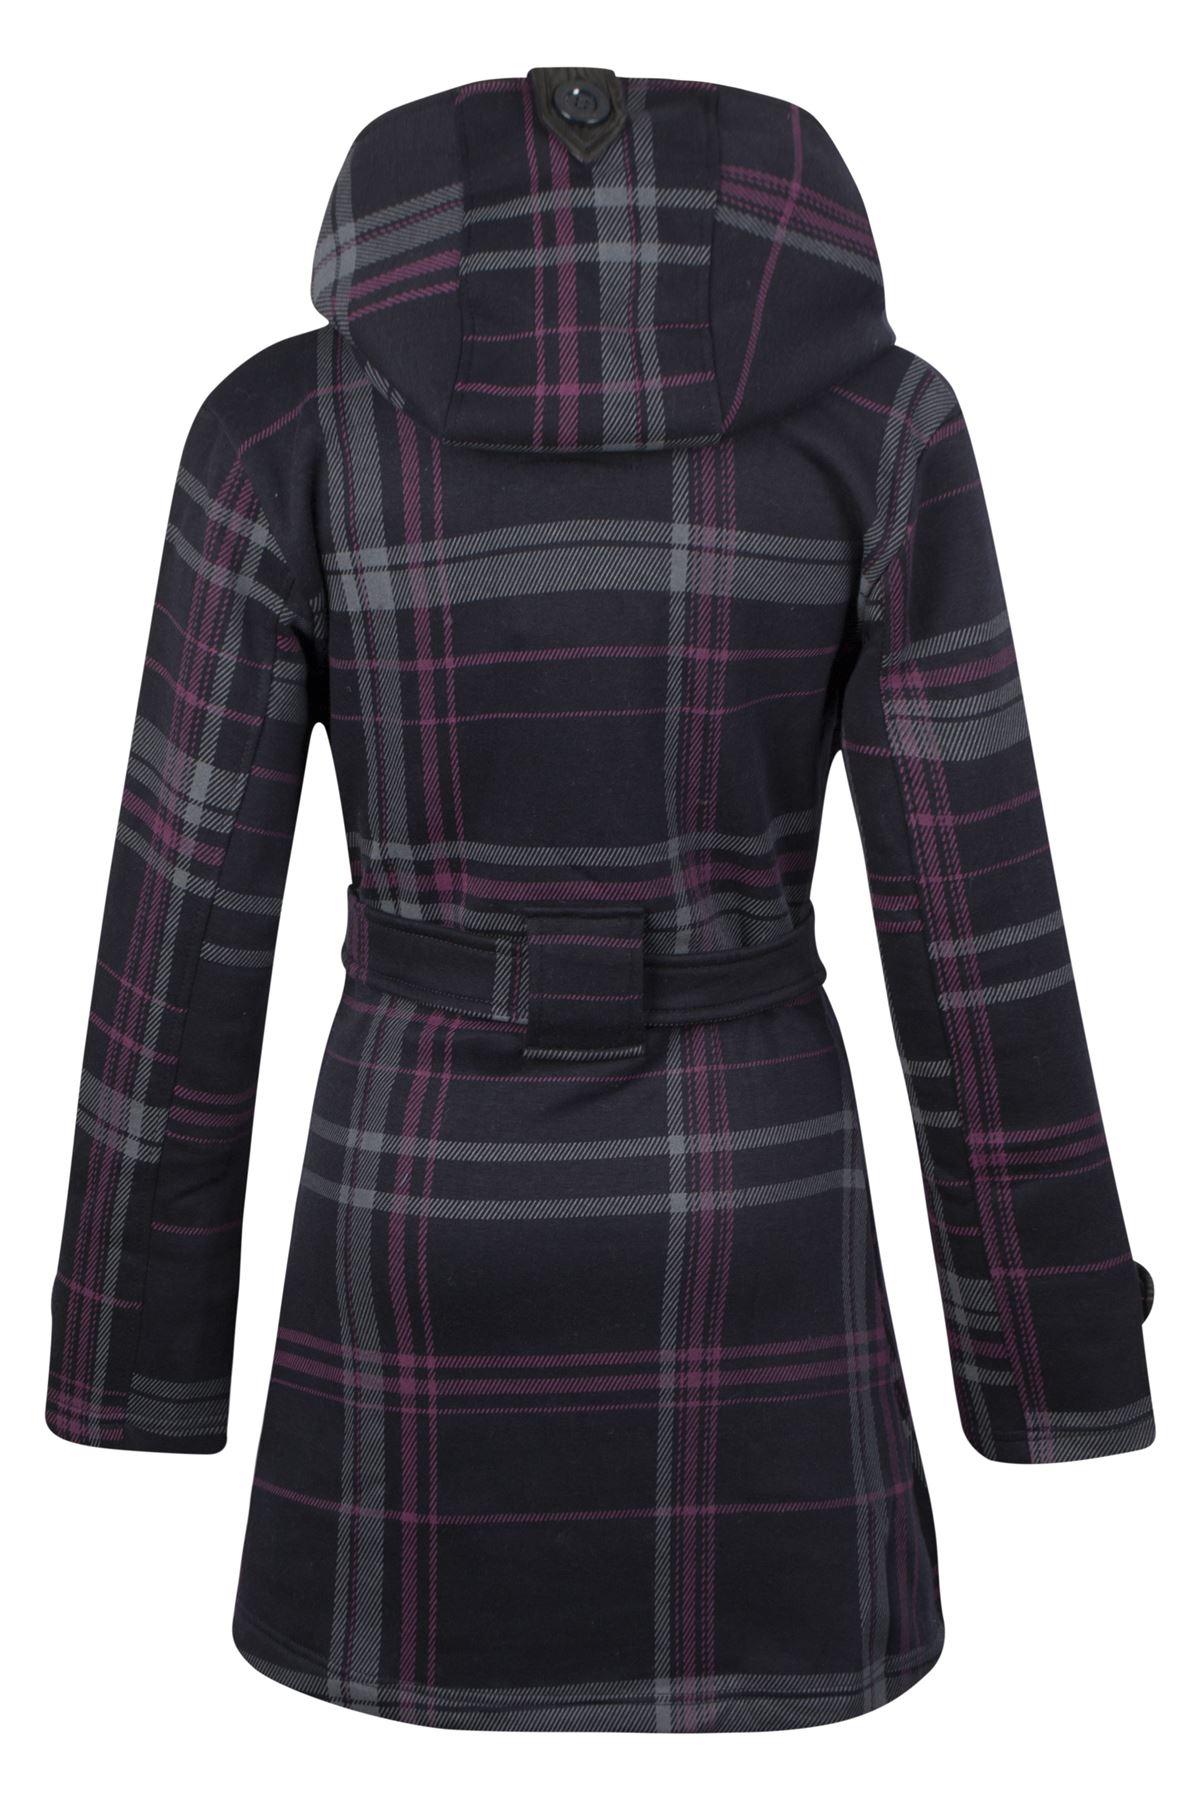 Womens-Belted-Ladies-Check-Hood-Coat-Fleece-Hooded-Button-Jacket-Size-UK8-14